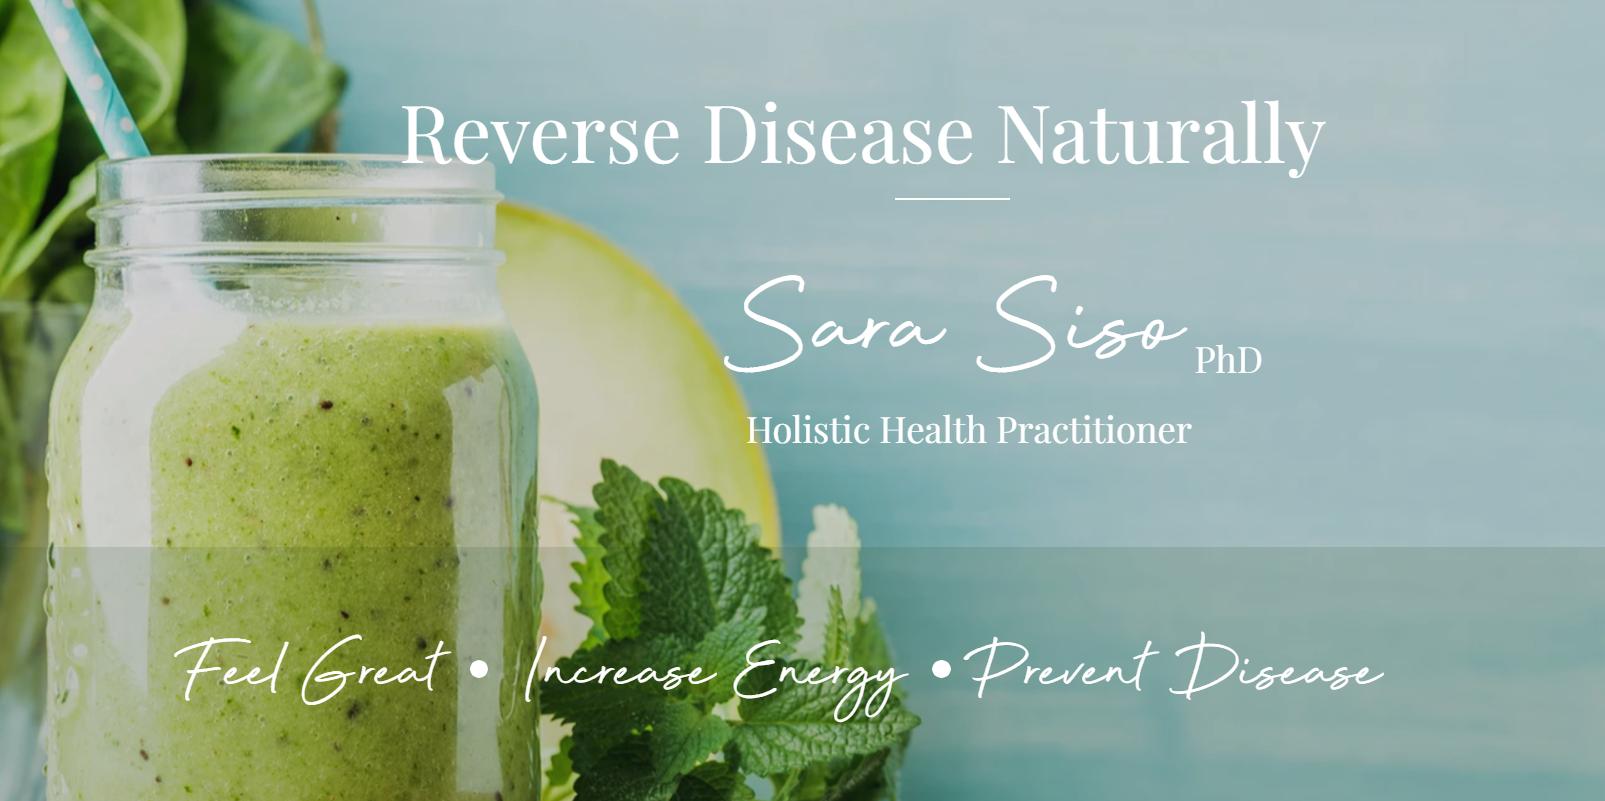 Reverse Disease Naturally